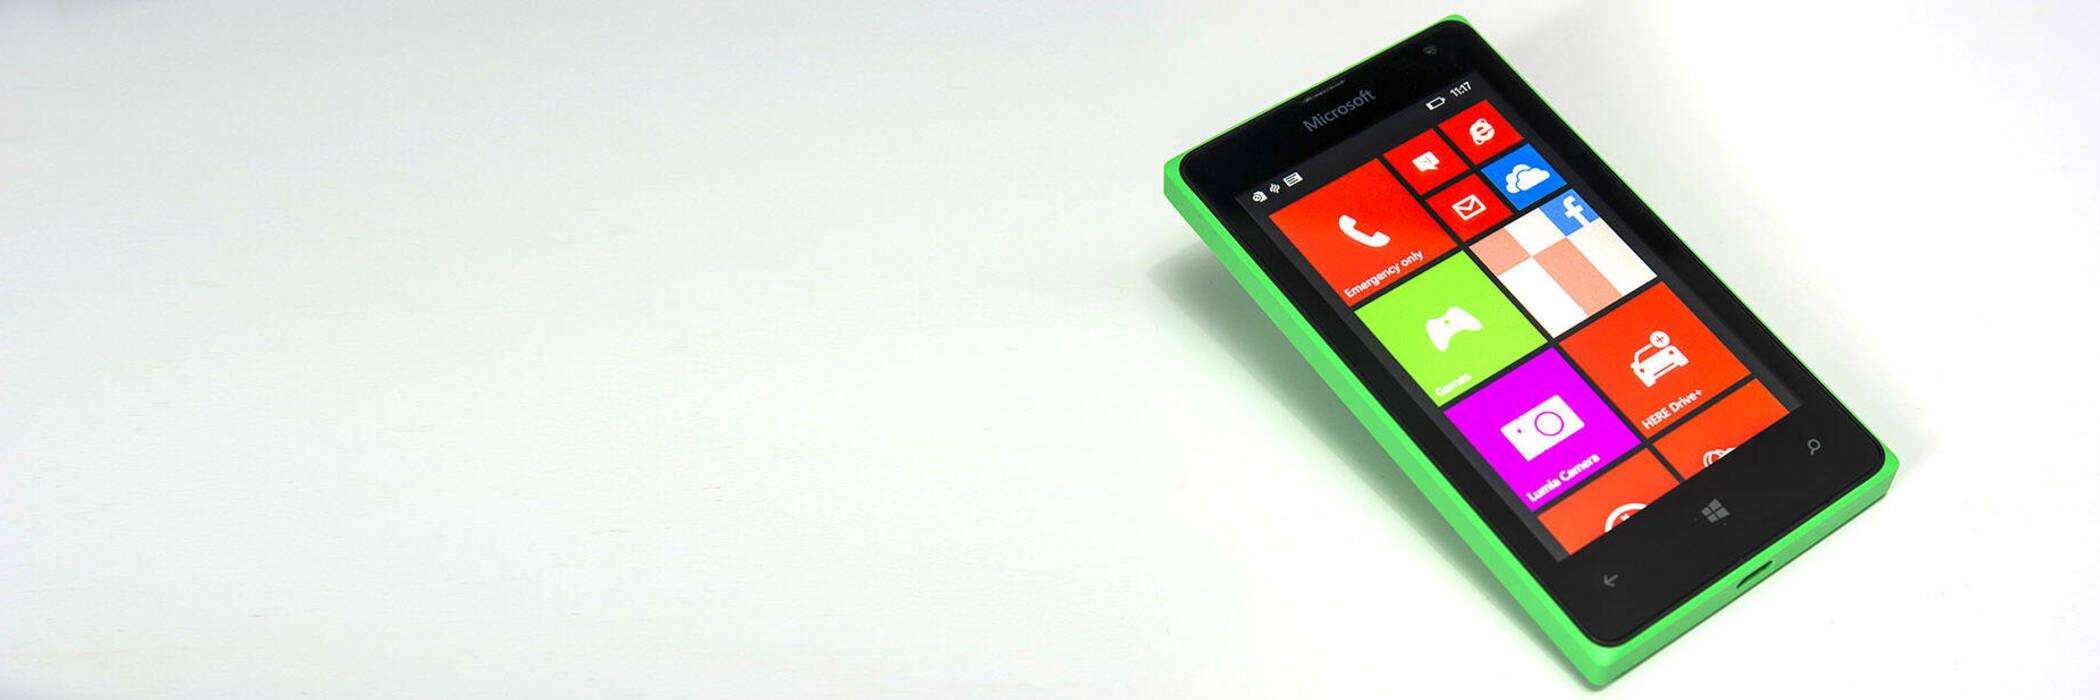 First look windows lumia 435 hero